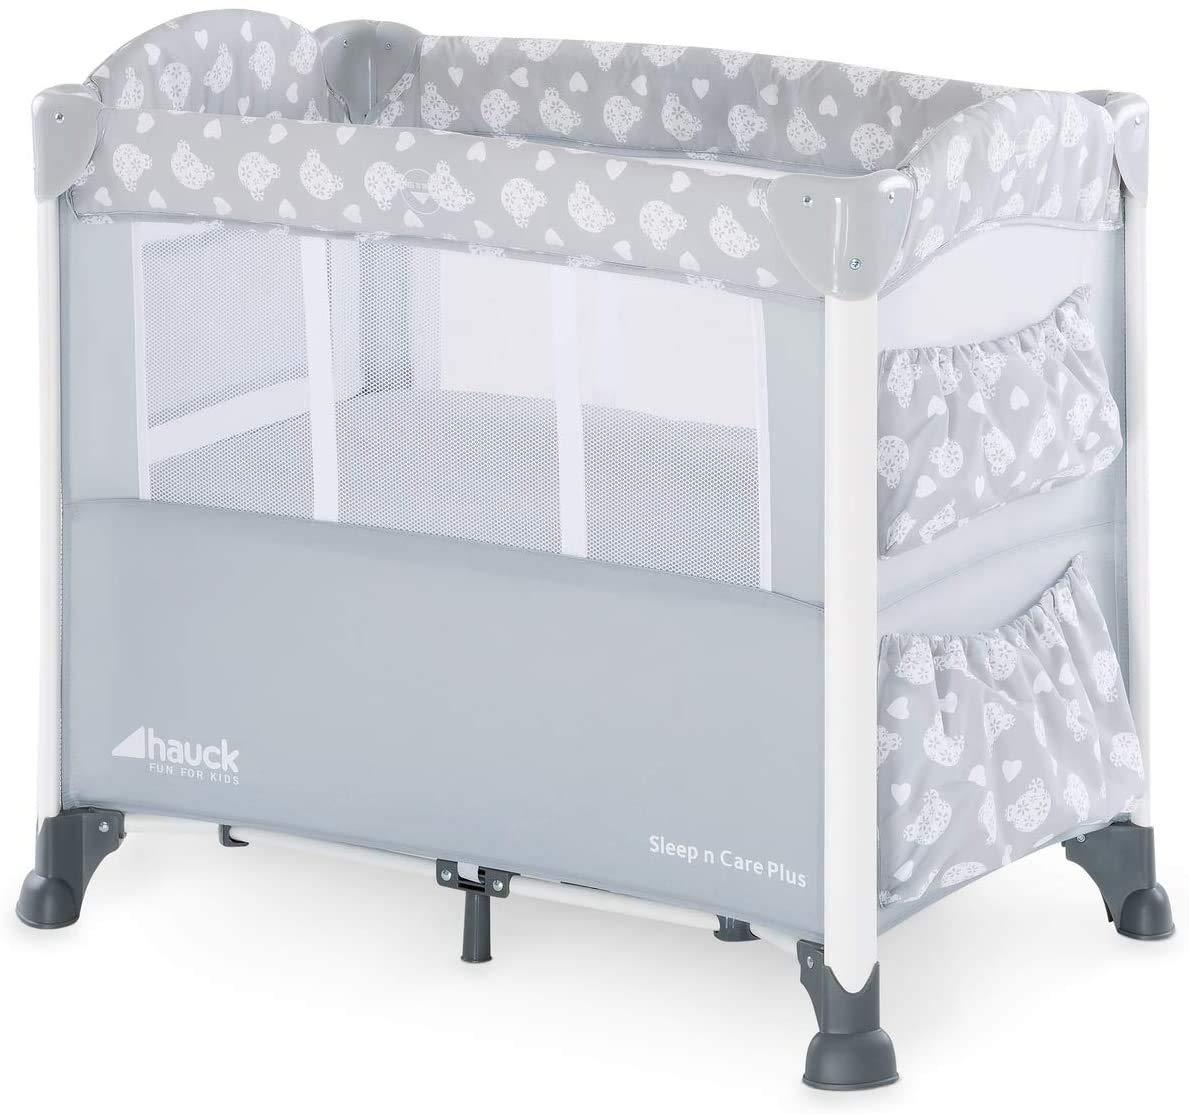 New Hauck Sleep n Care Plus Travel Cot/Bedside Crib - Teddy Grey